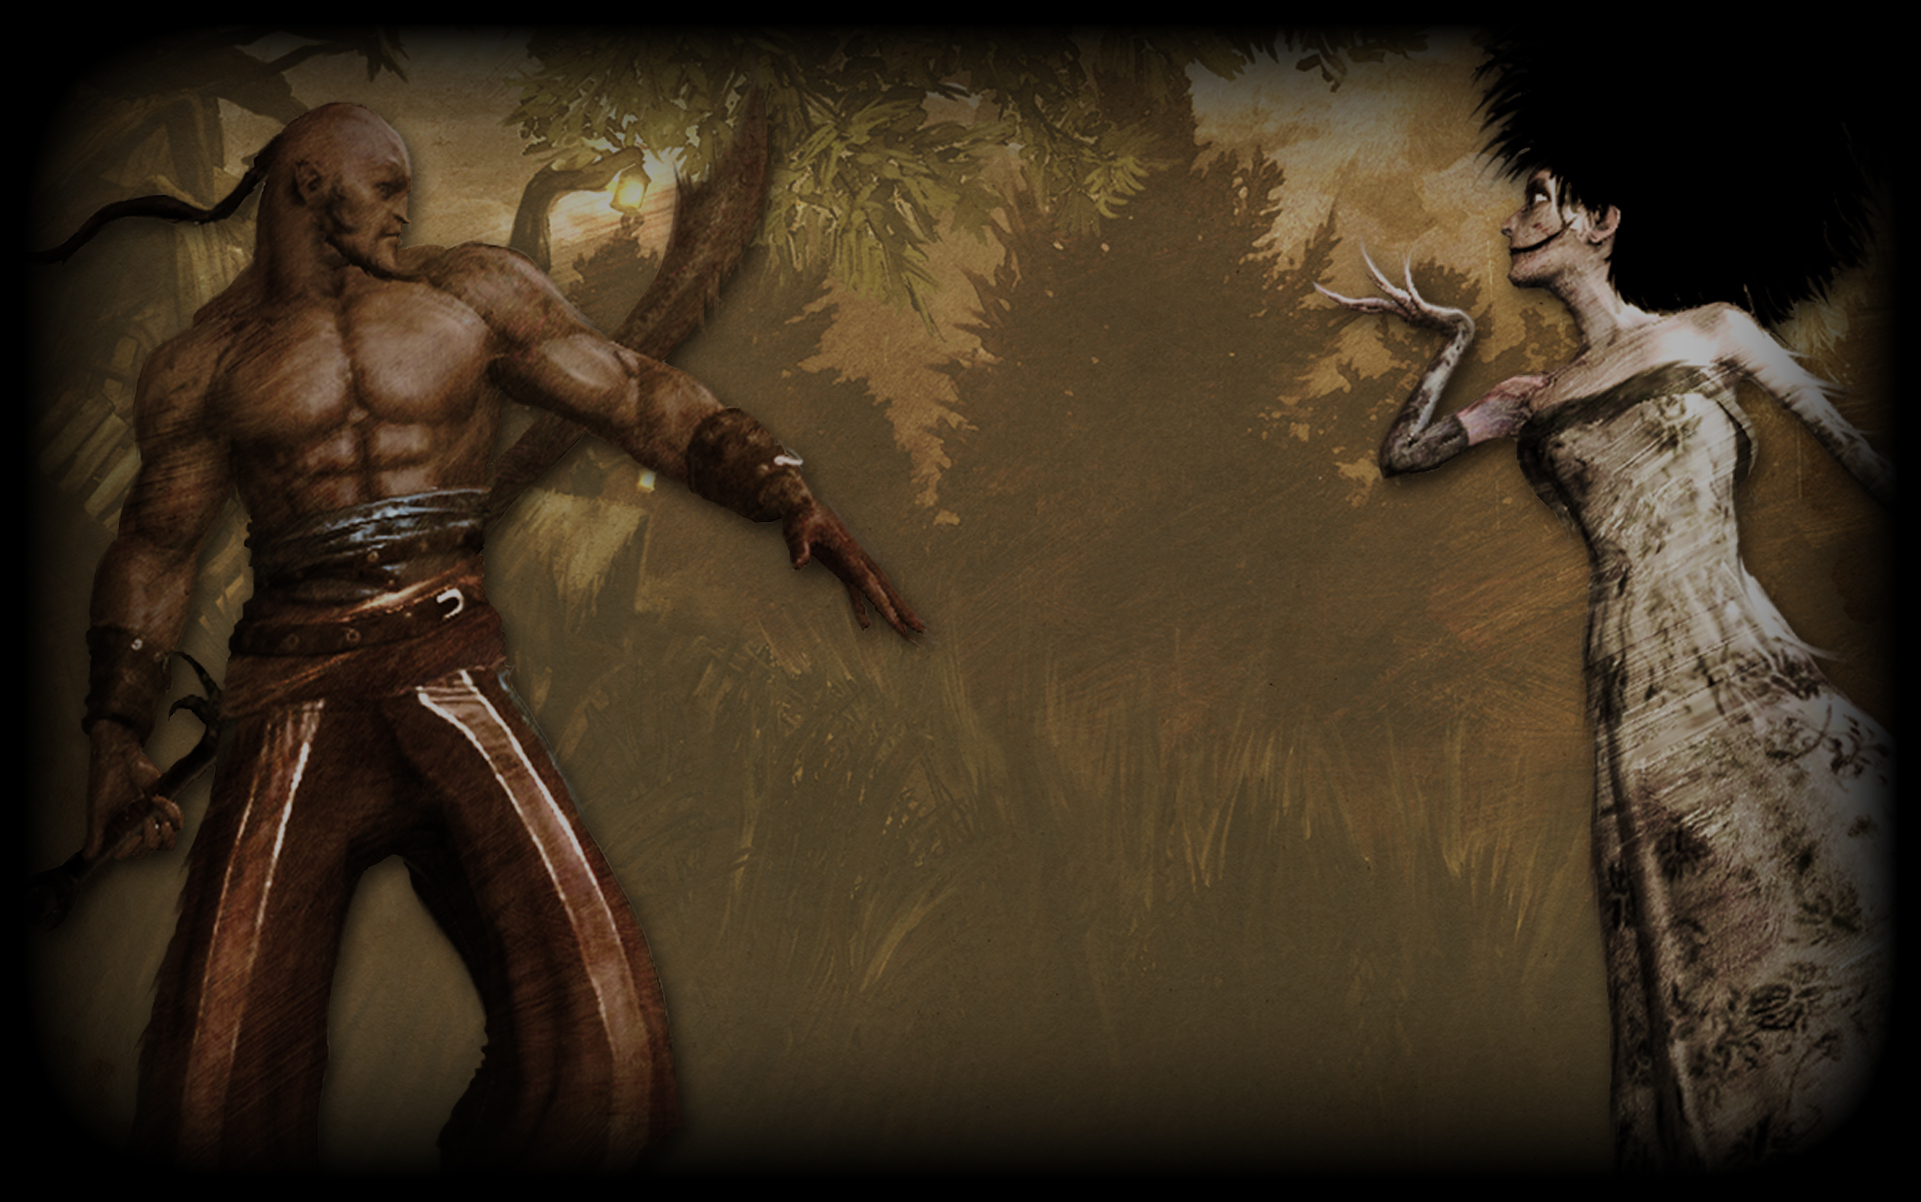 Showcase :: Faery - Legends of Avalon